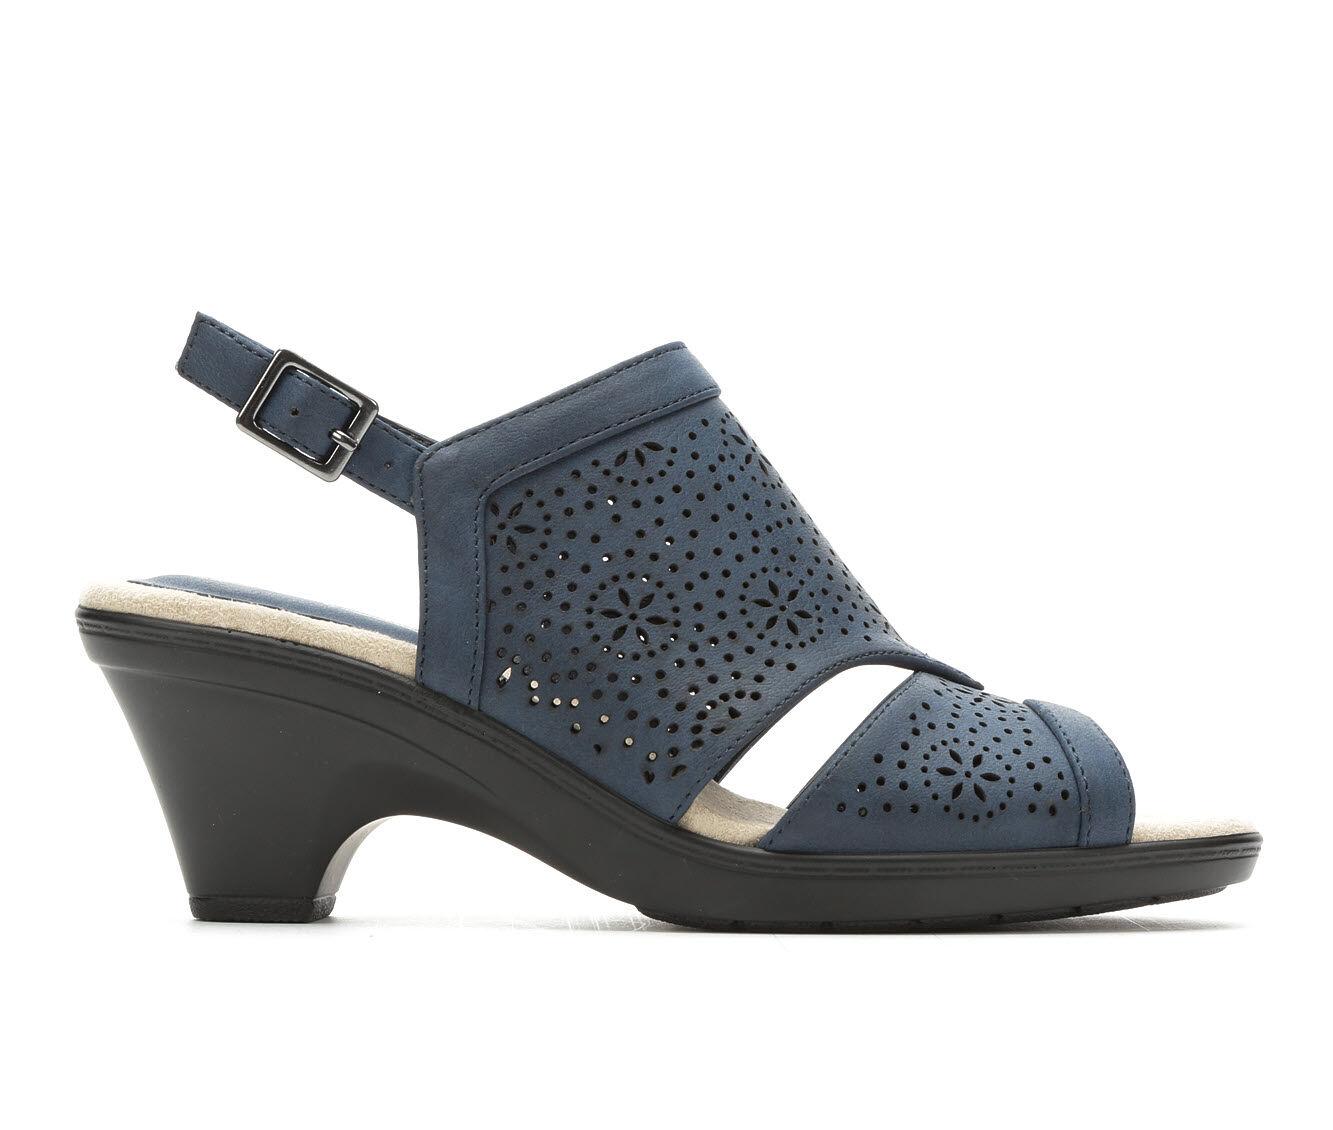 uk shoes_kd5724